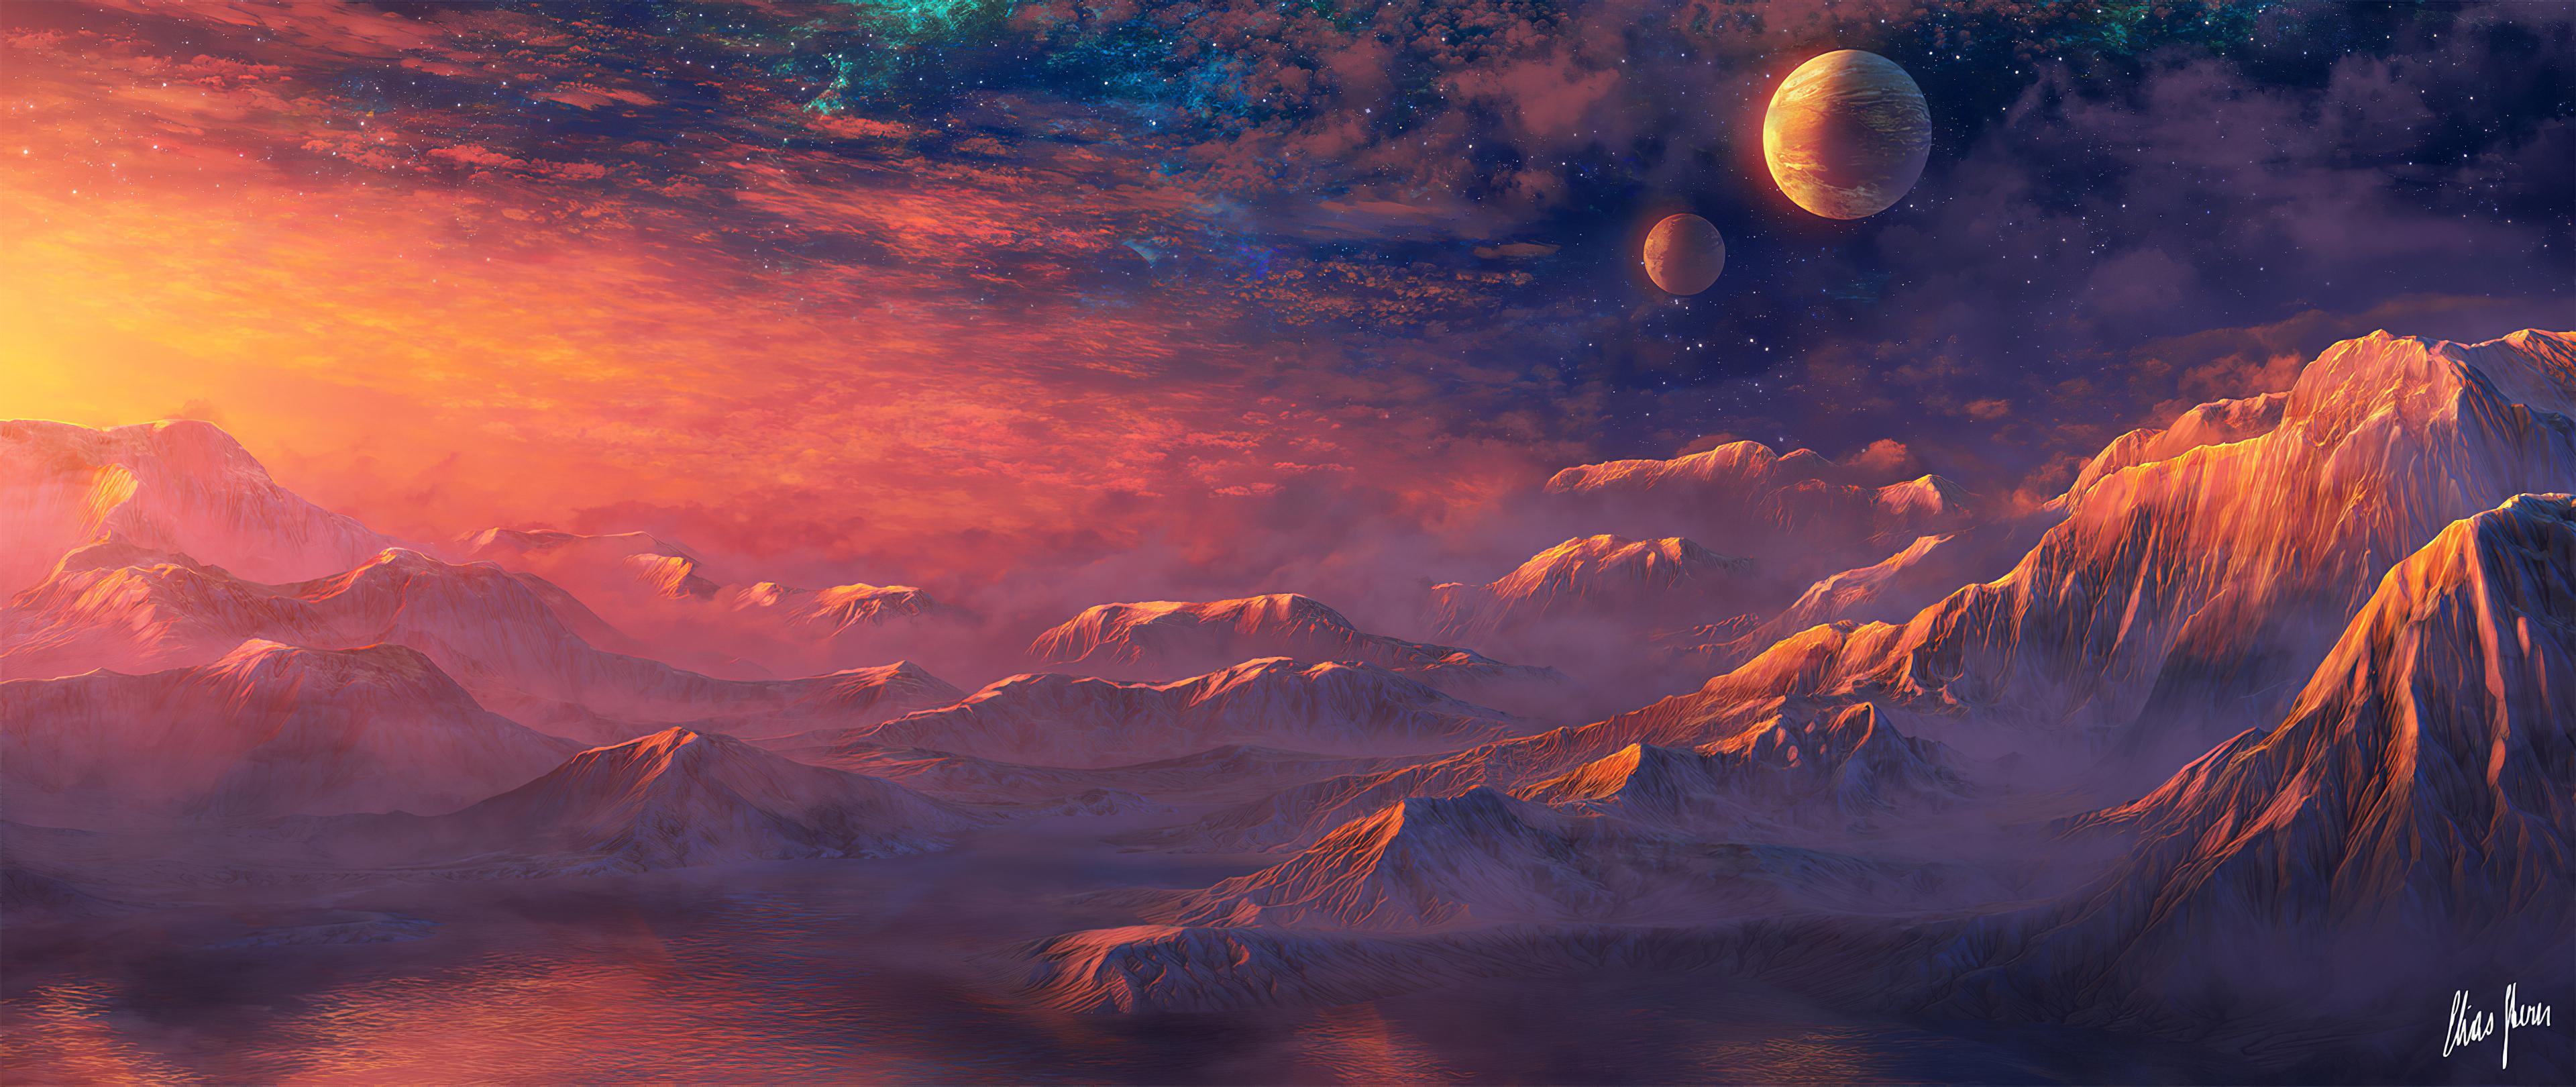 alien world nature space 4k 1580054860 - Alien World Nature Space 4k - Alien World Nature wallpaper 4k